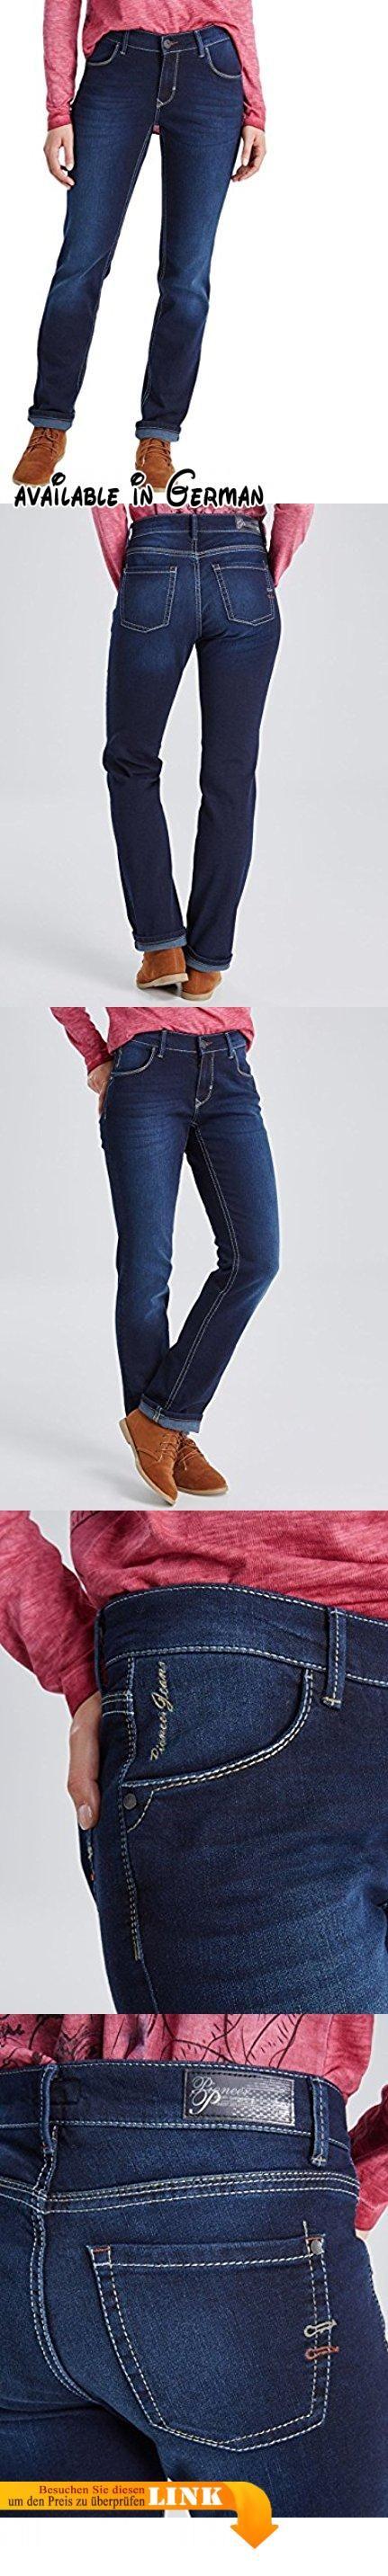 Pioneer Damen Jeanshose Sally, Blau (Dark Blue 467), W36/L32. Stil: Straight Leg. Stil: Straight Leg. Straight Leg #Apparel #PANTS